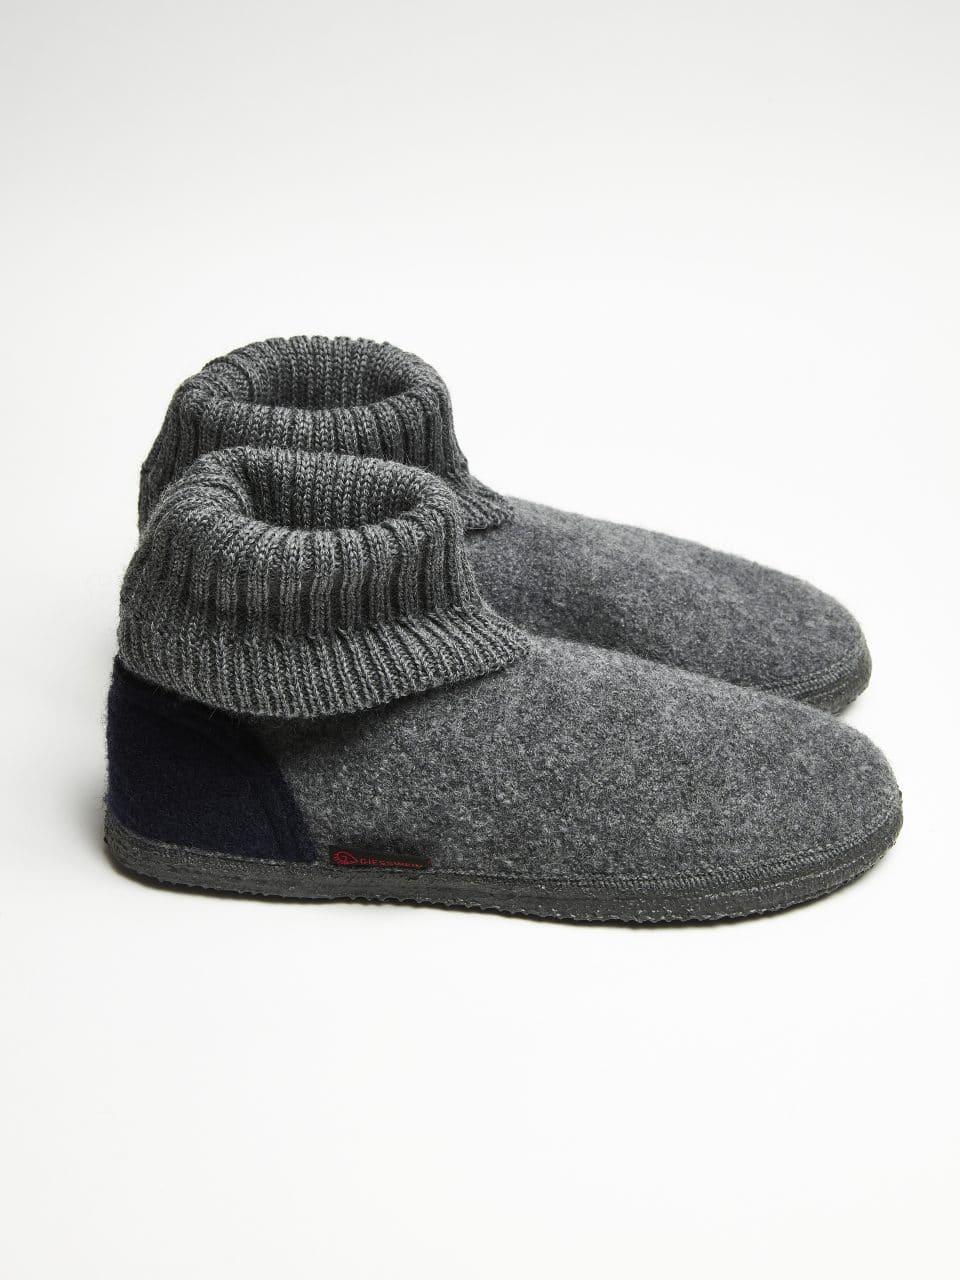 Kramsach Schiefer Giesswein en Loyna Shoes